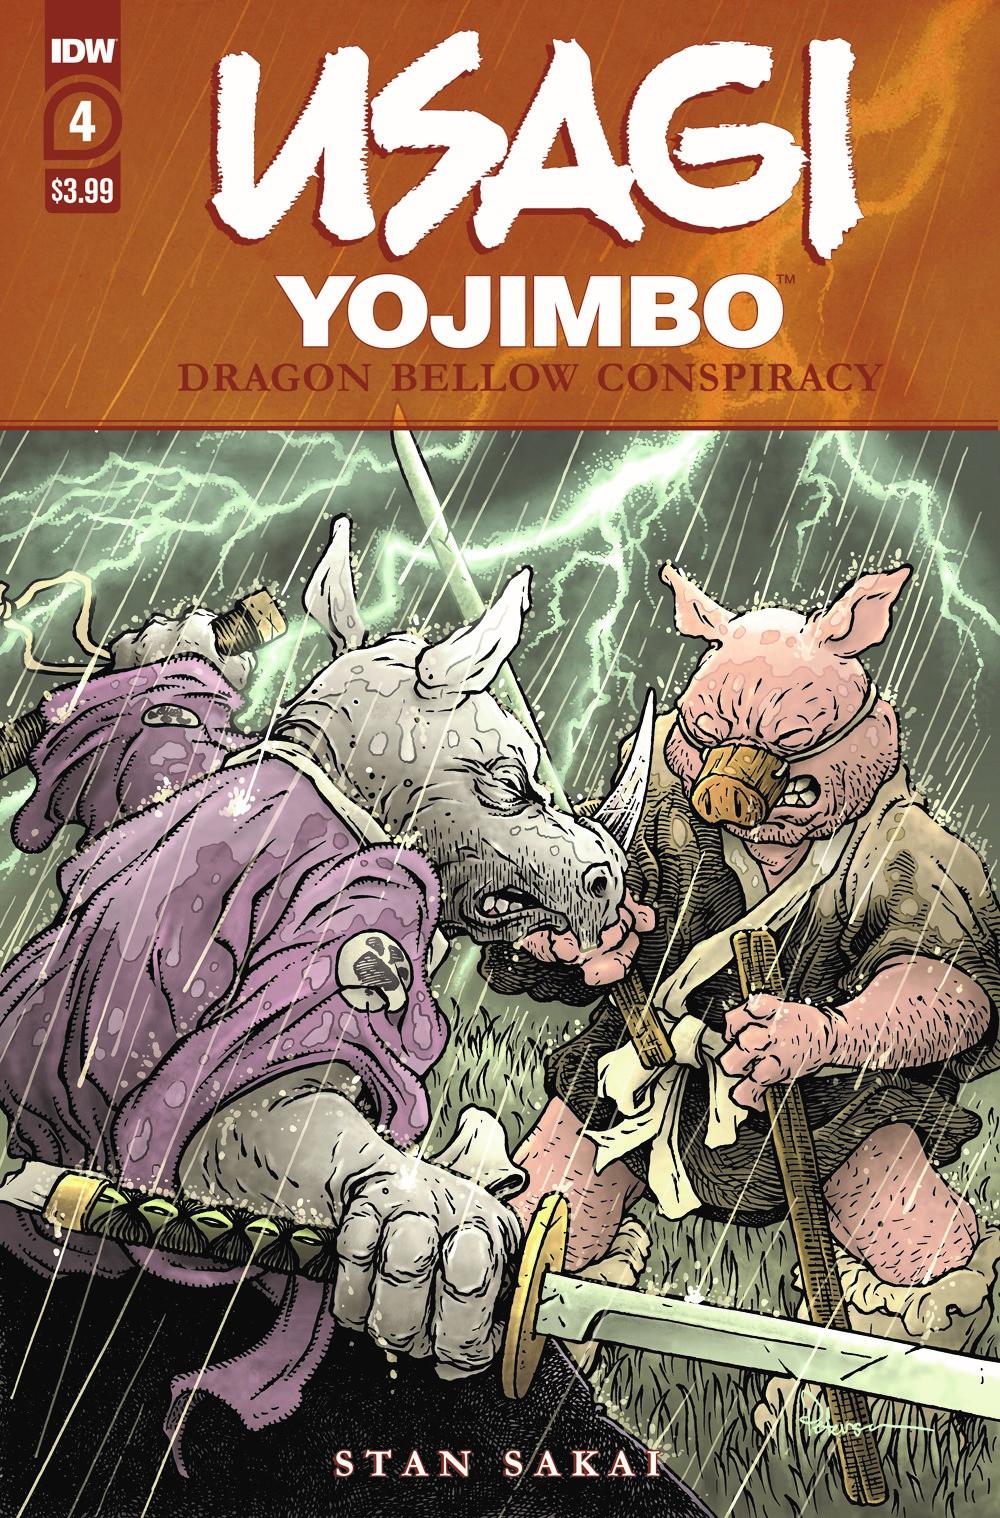 Usagi-DBC04_cvrA ComicList Previews: USAGI YOJIMBO THE DRAGON BELLOW CONSPIRACY #4 (OF 6)